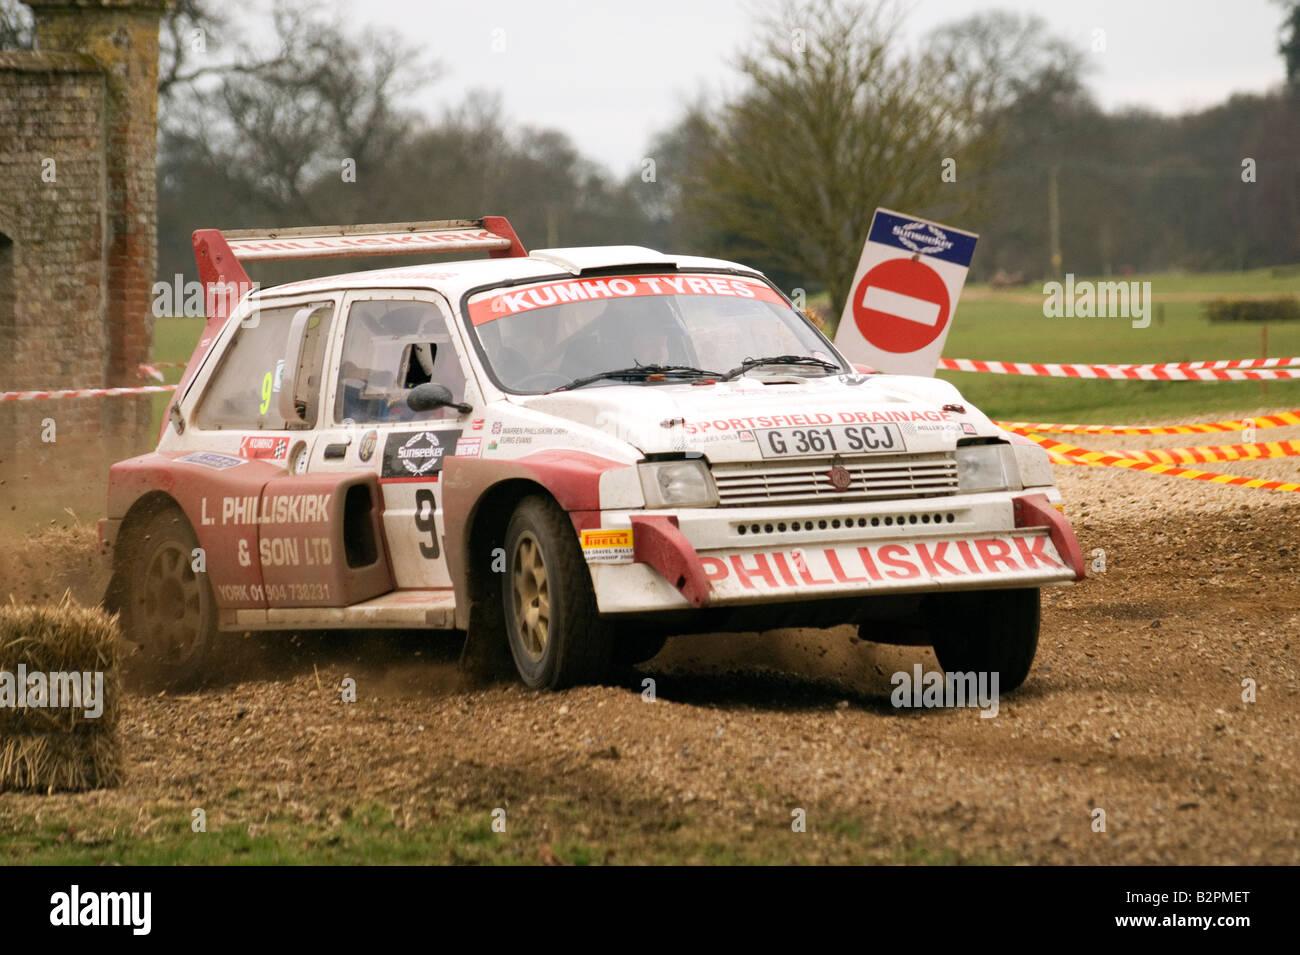 Metro Rally Car Stock Photos & Metro Rally Car Stock Images - Alamy